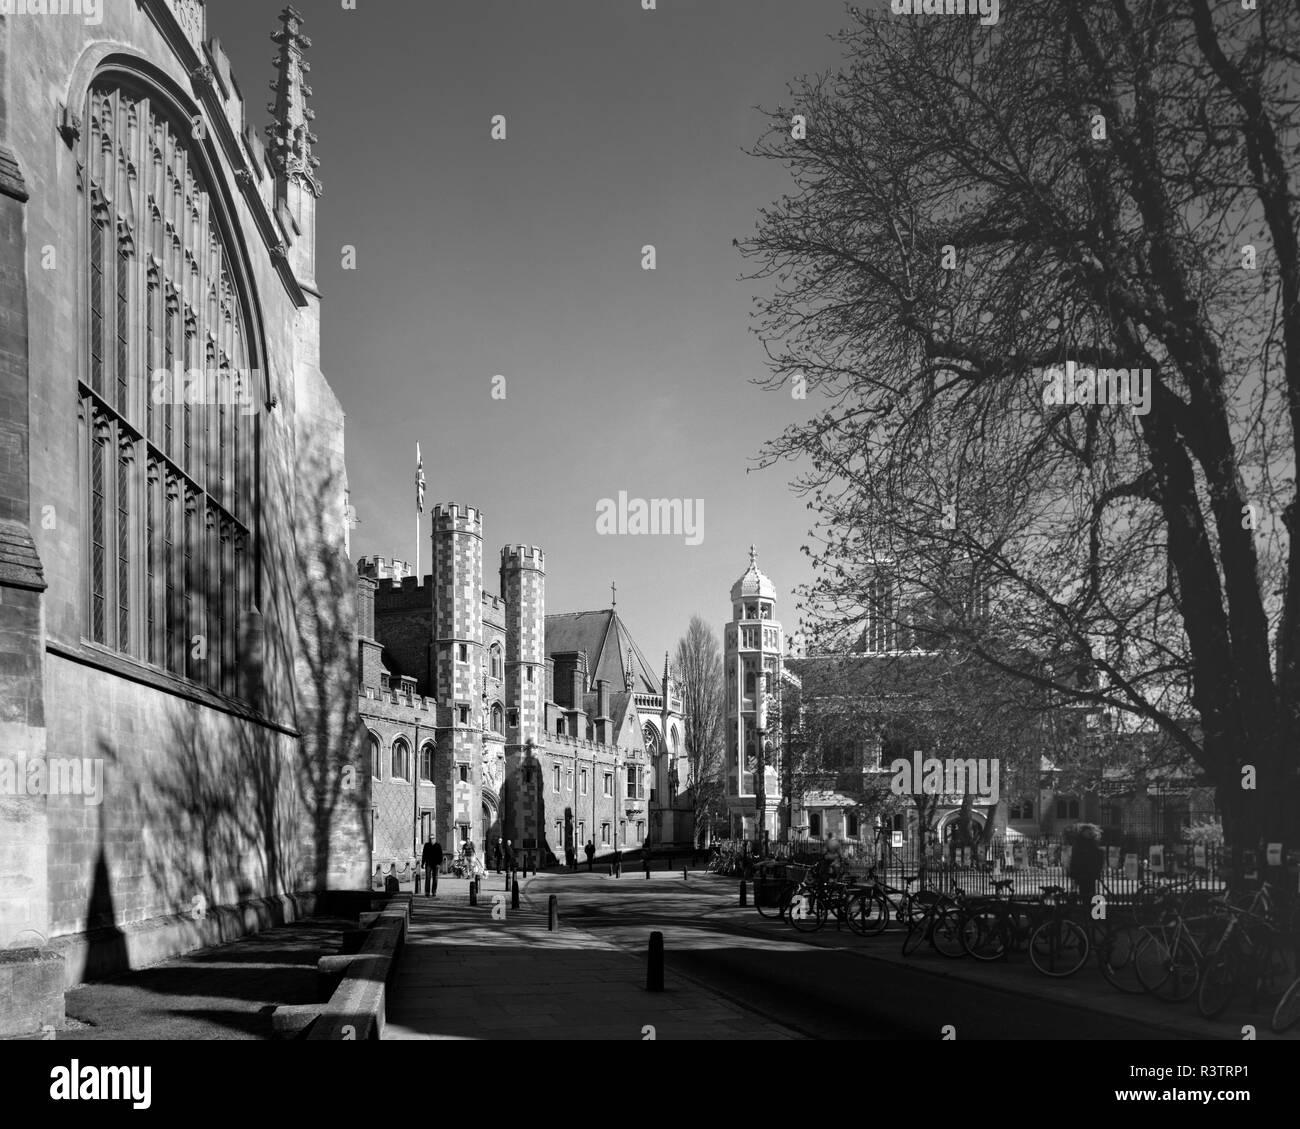 St Johns Street Cambridge England in winter sunshine - Stock Image